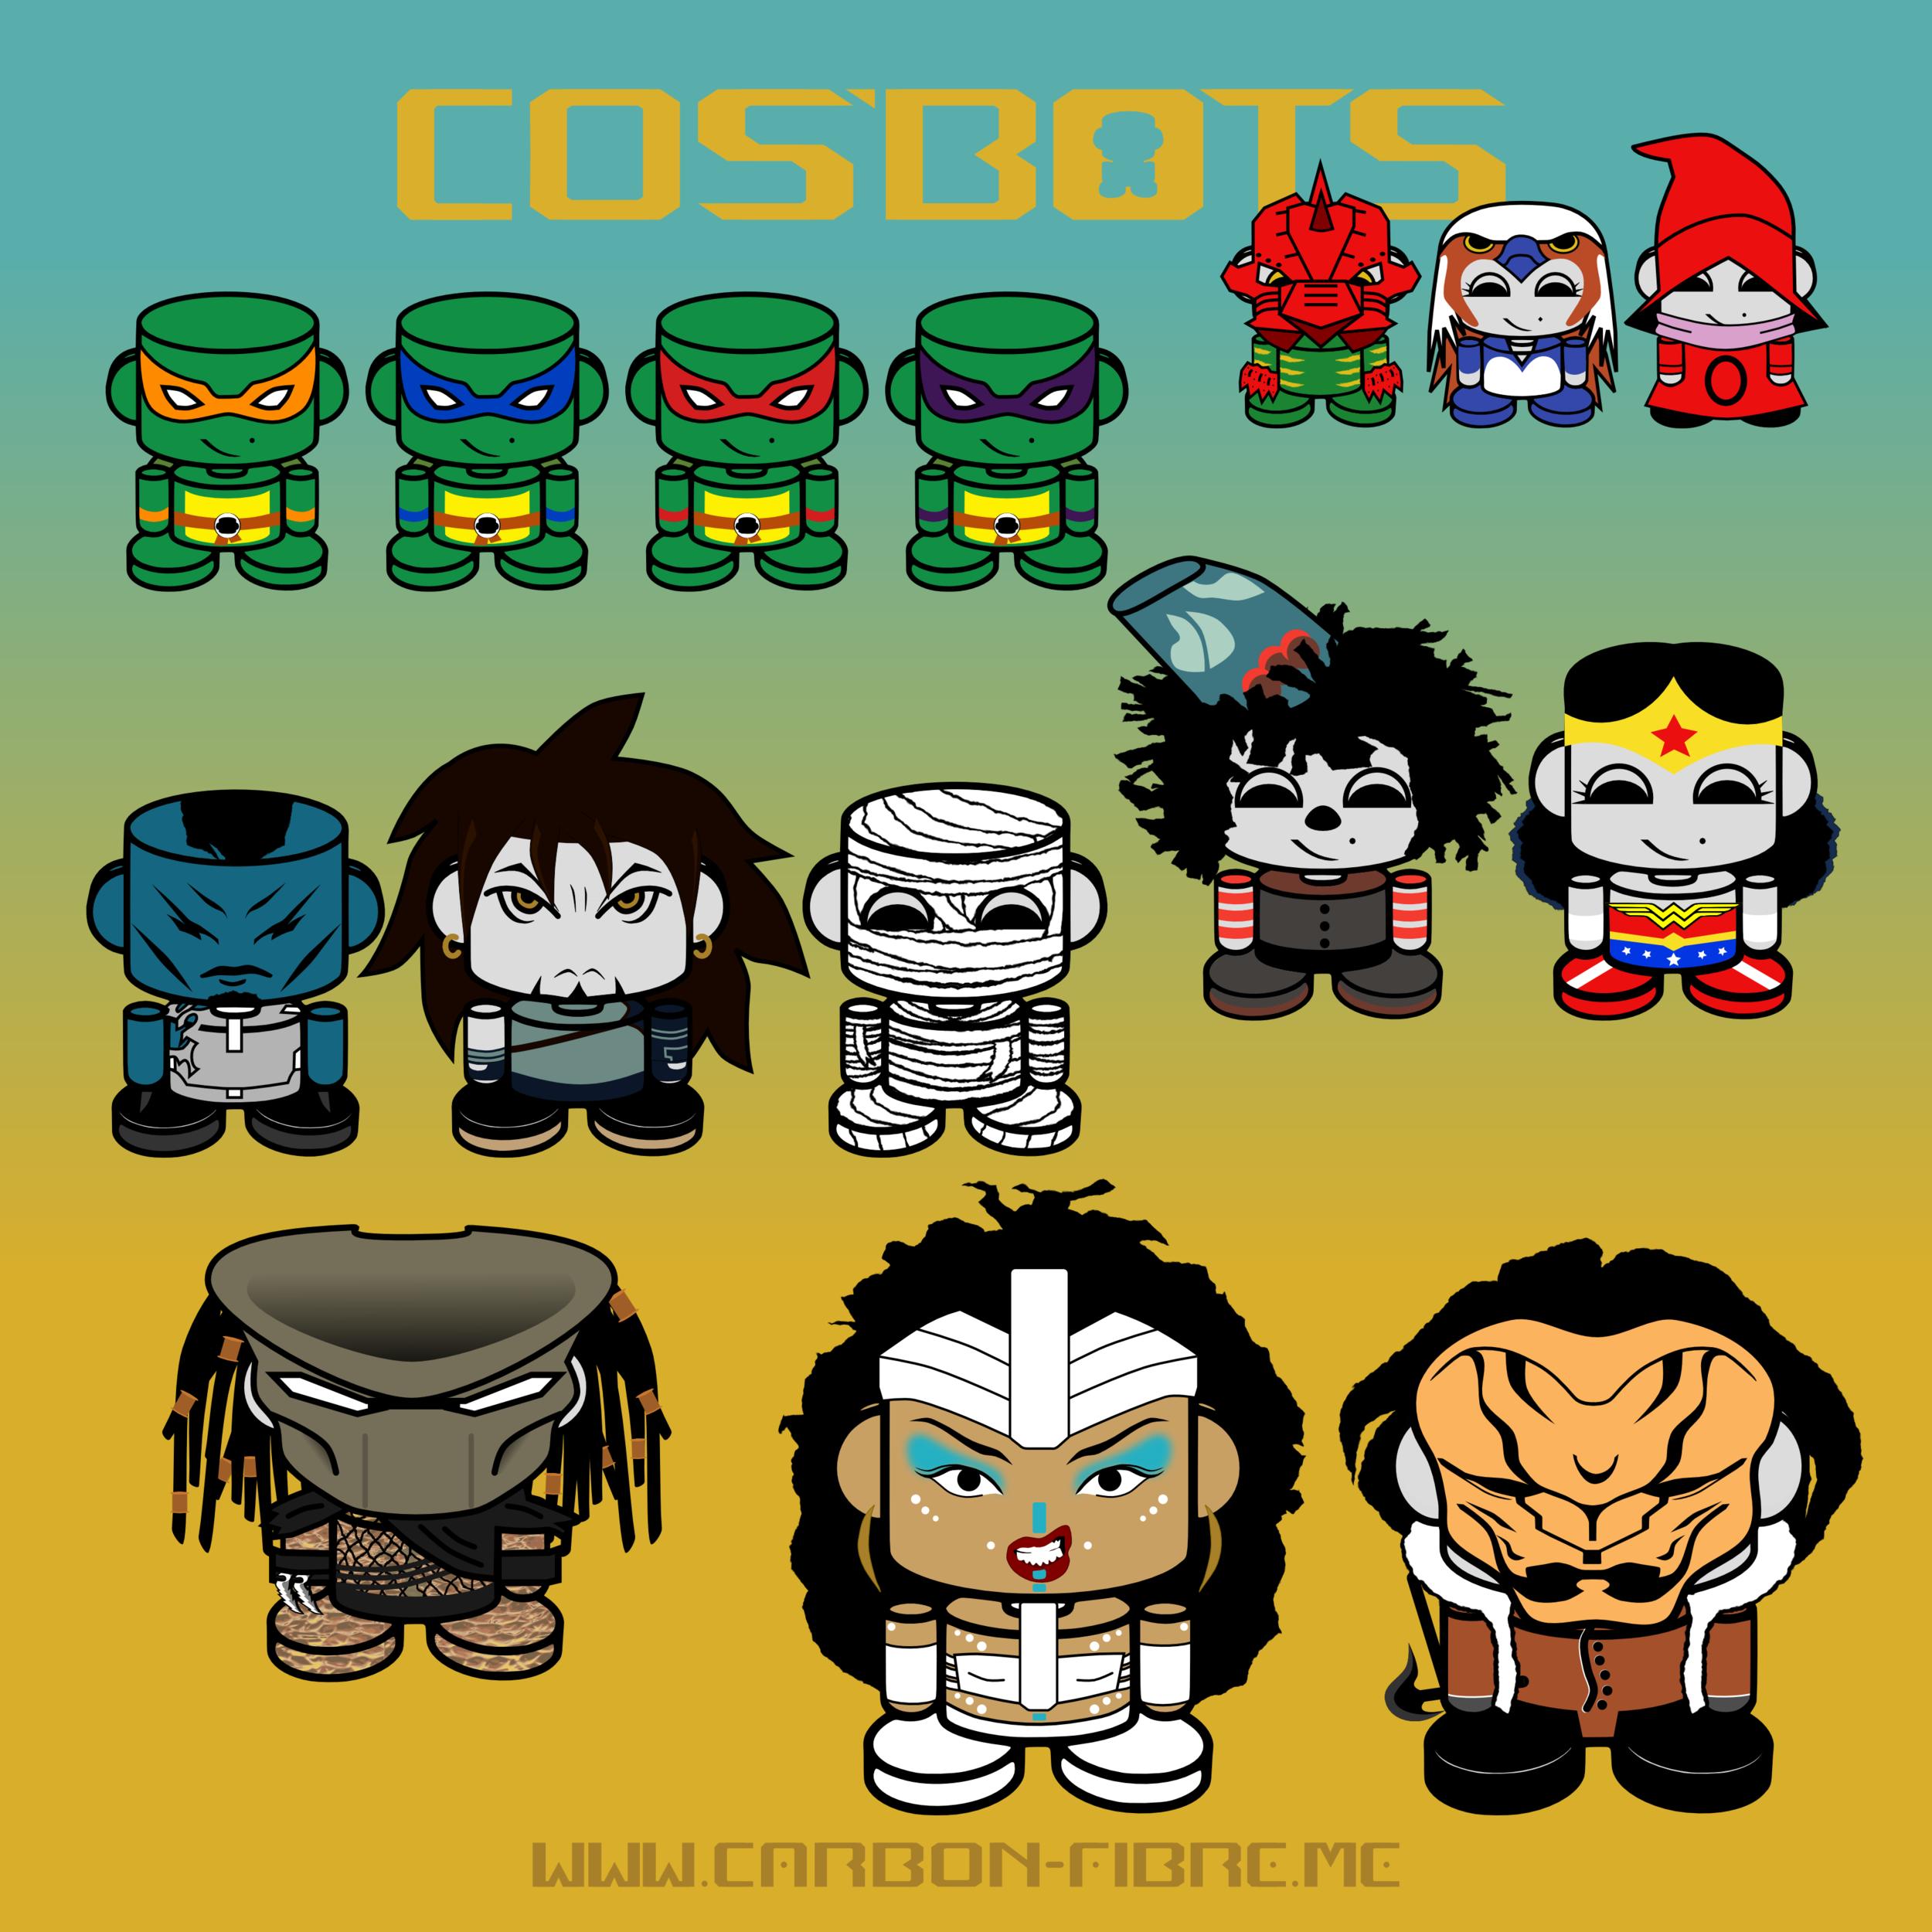 carbonfibreme_cosbots_cosplay_robots_obots_onjenayo_group_square.png